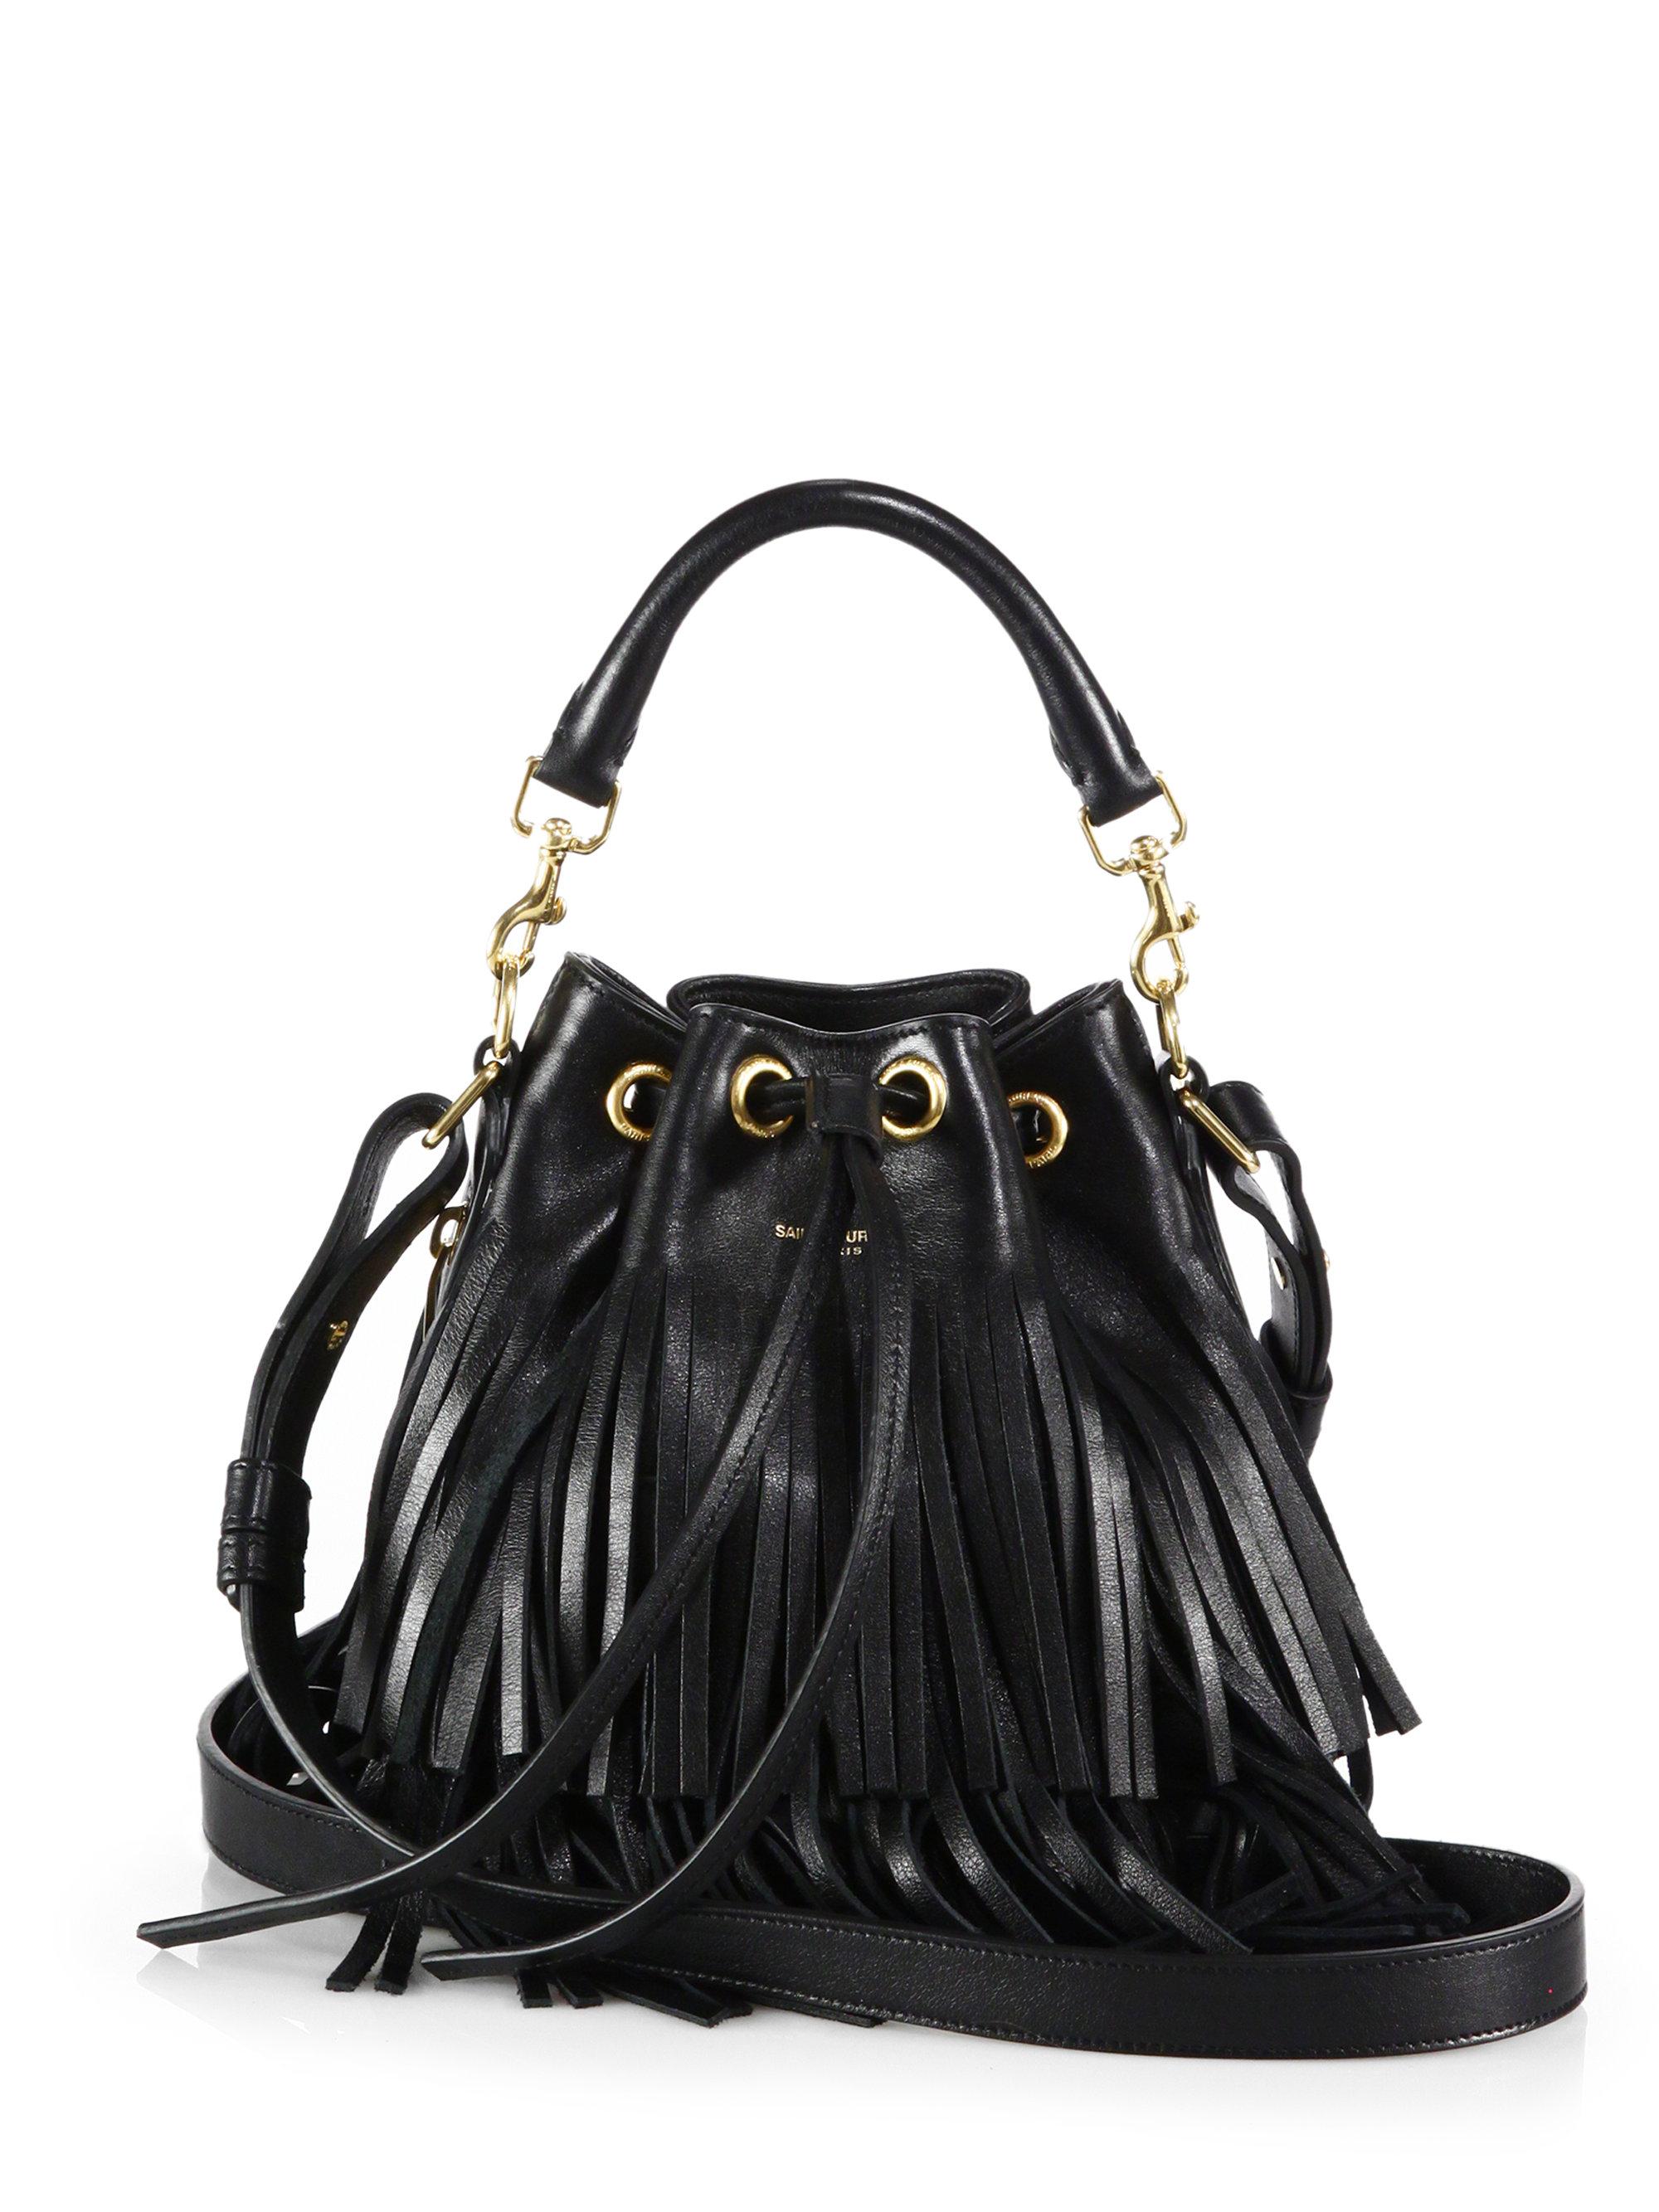 Find great deals on eBay for black fringe purse. Shop with confidence.